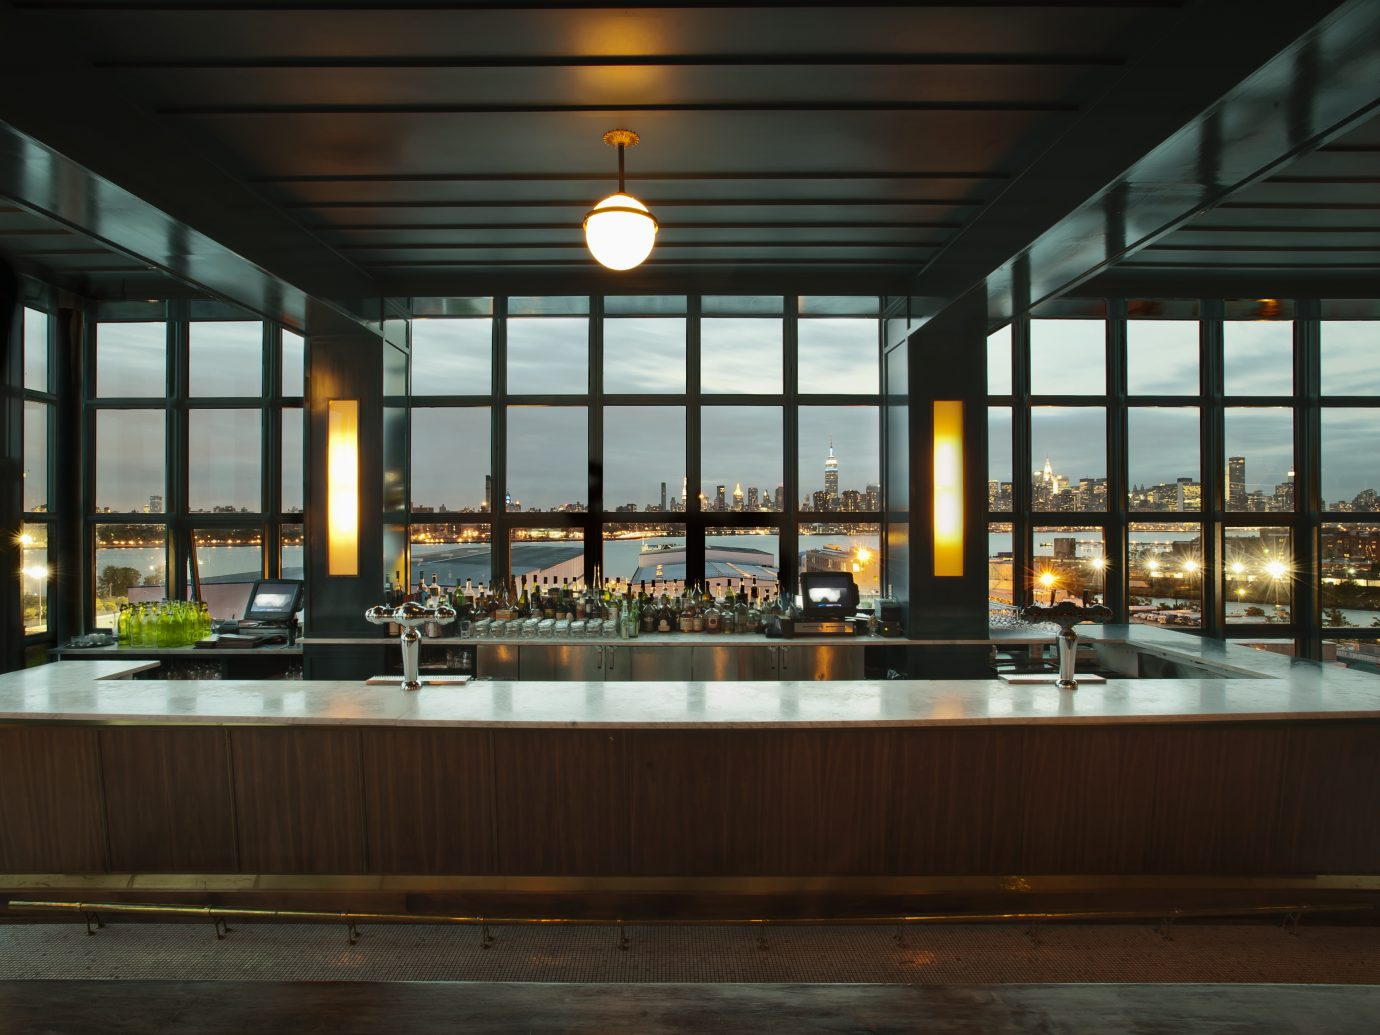 bar top looking over city skyline